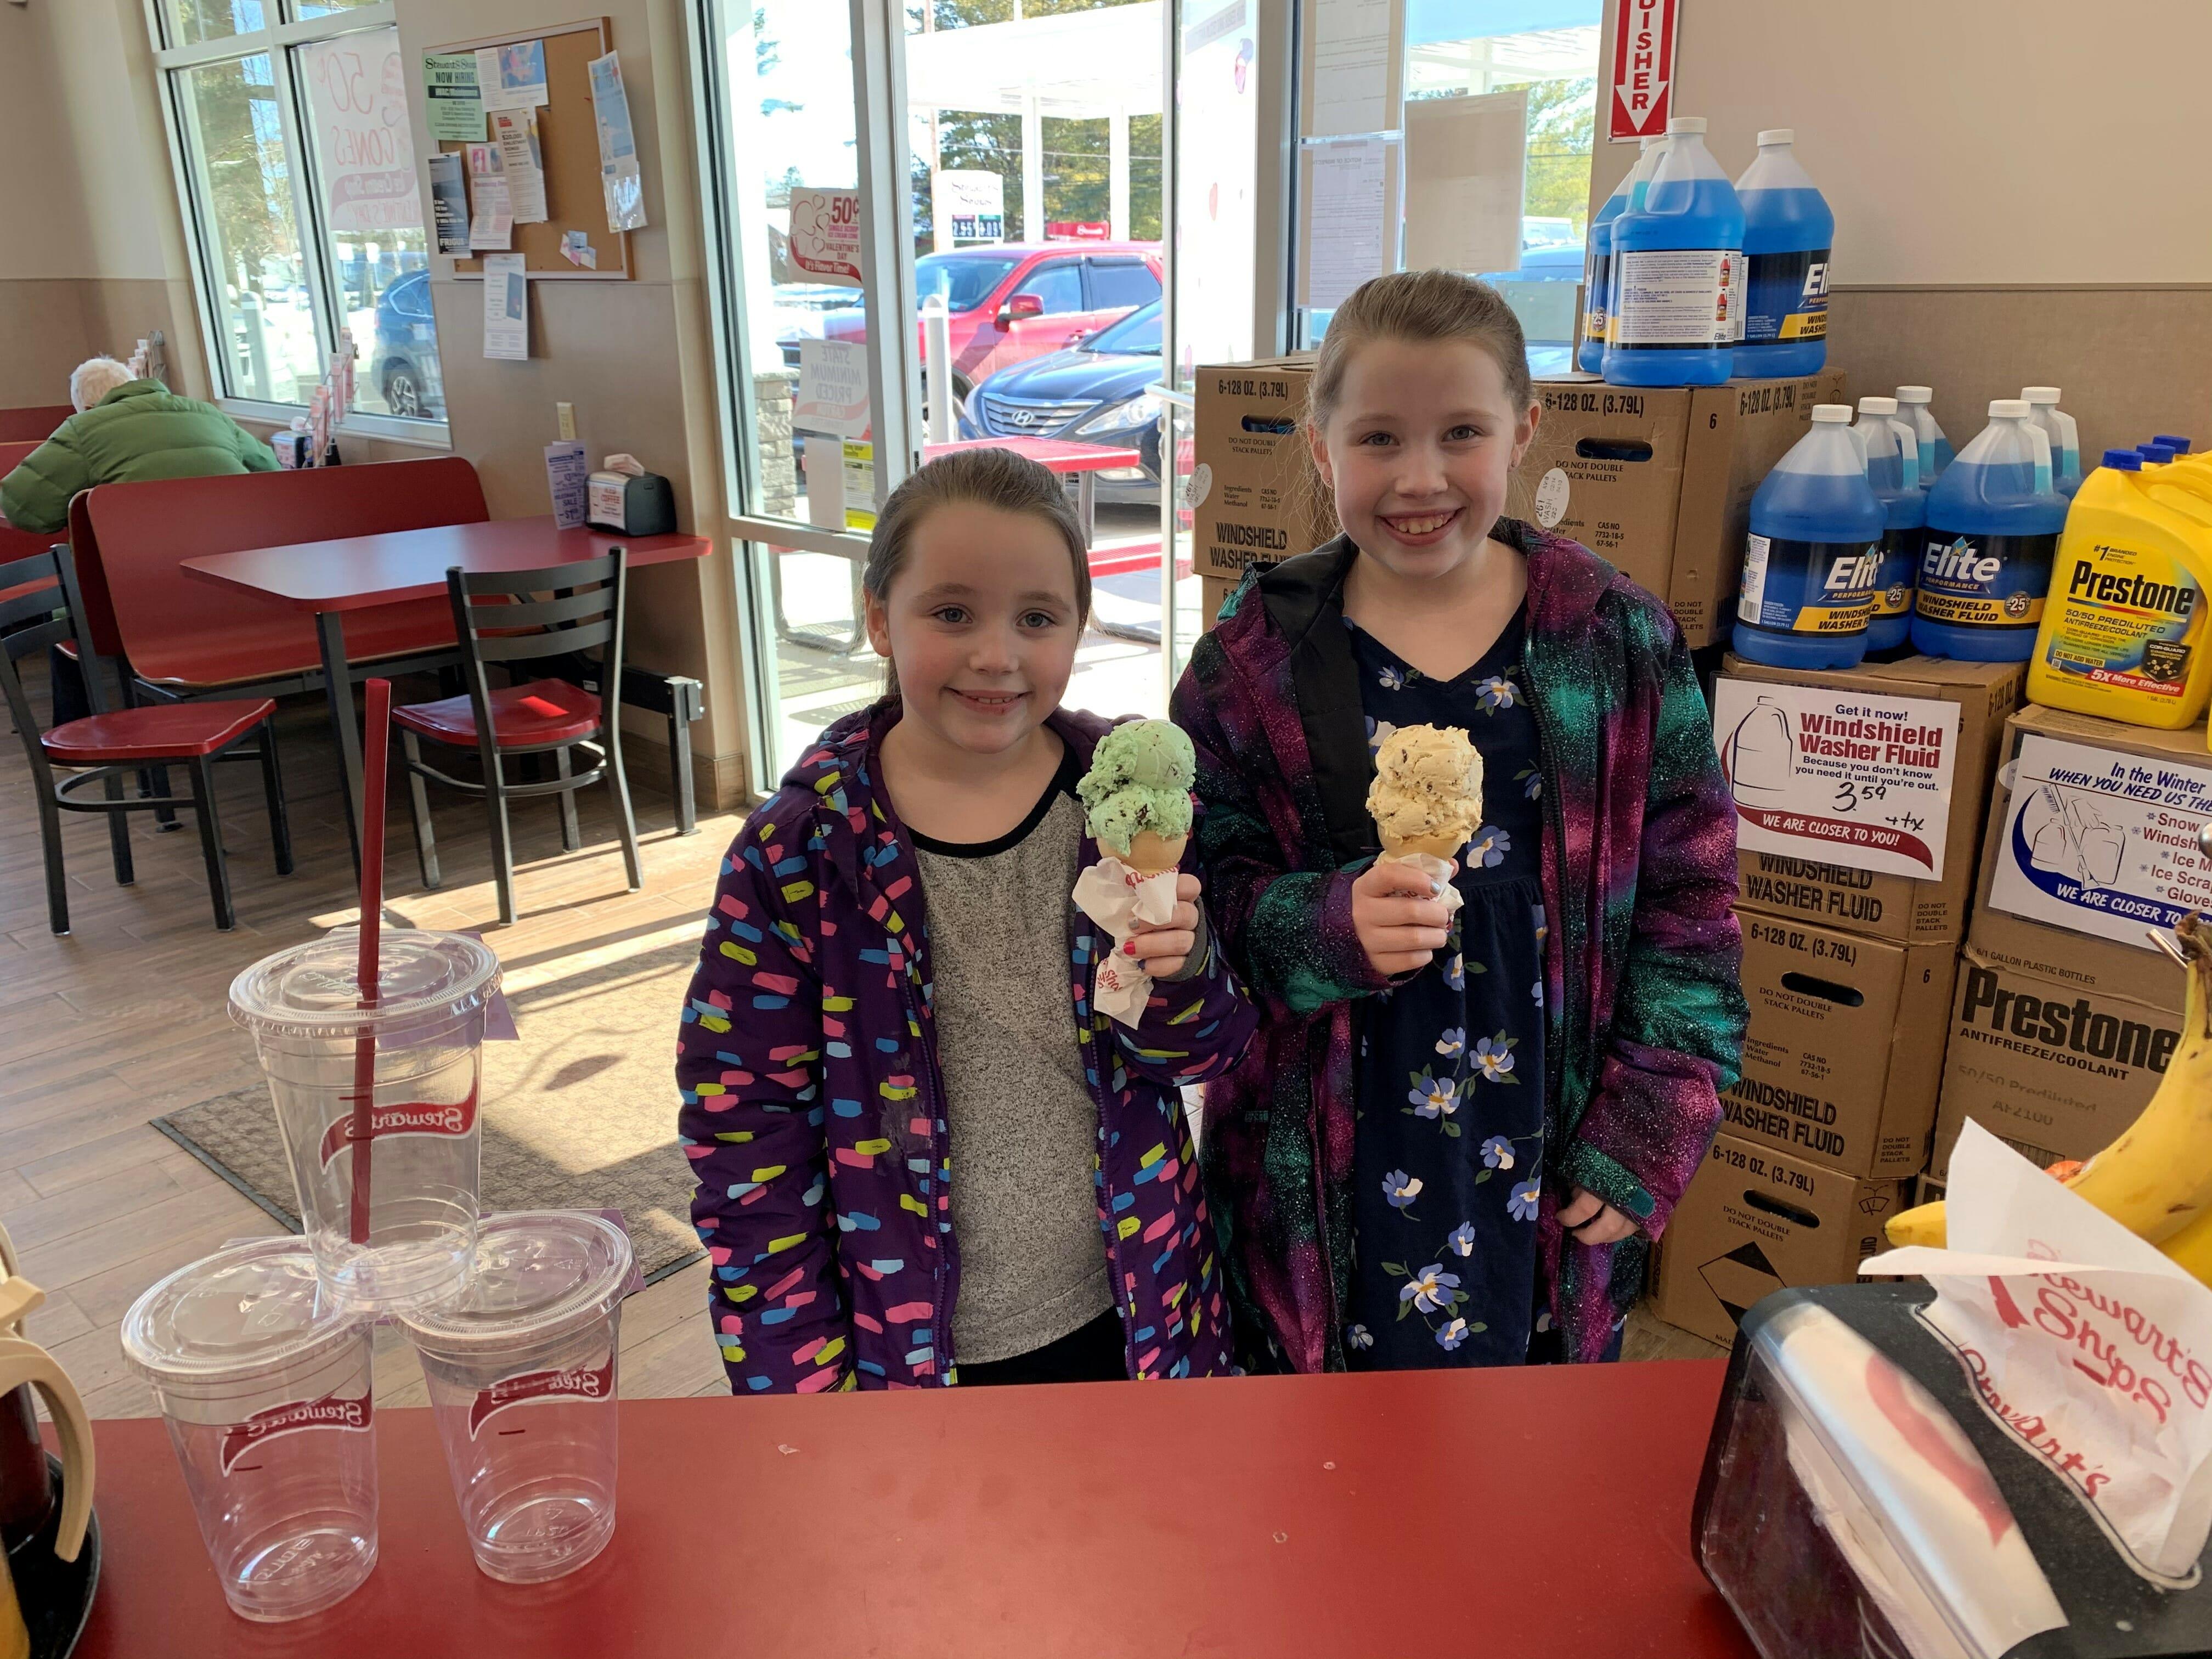 Two girls having ice cream cones